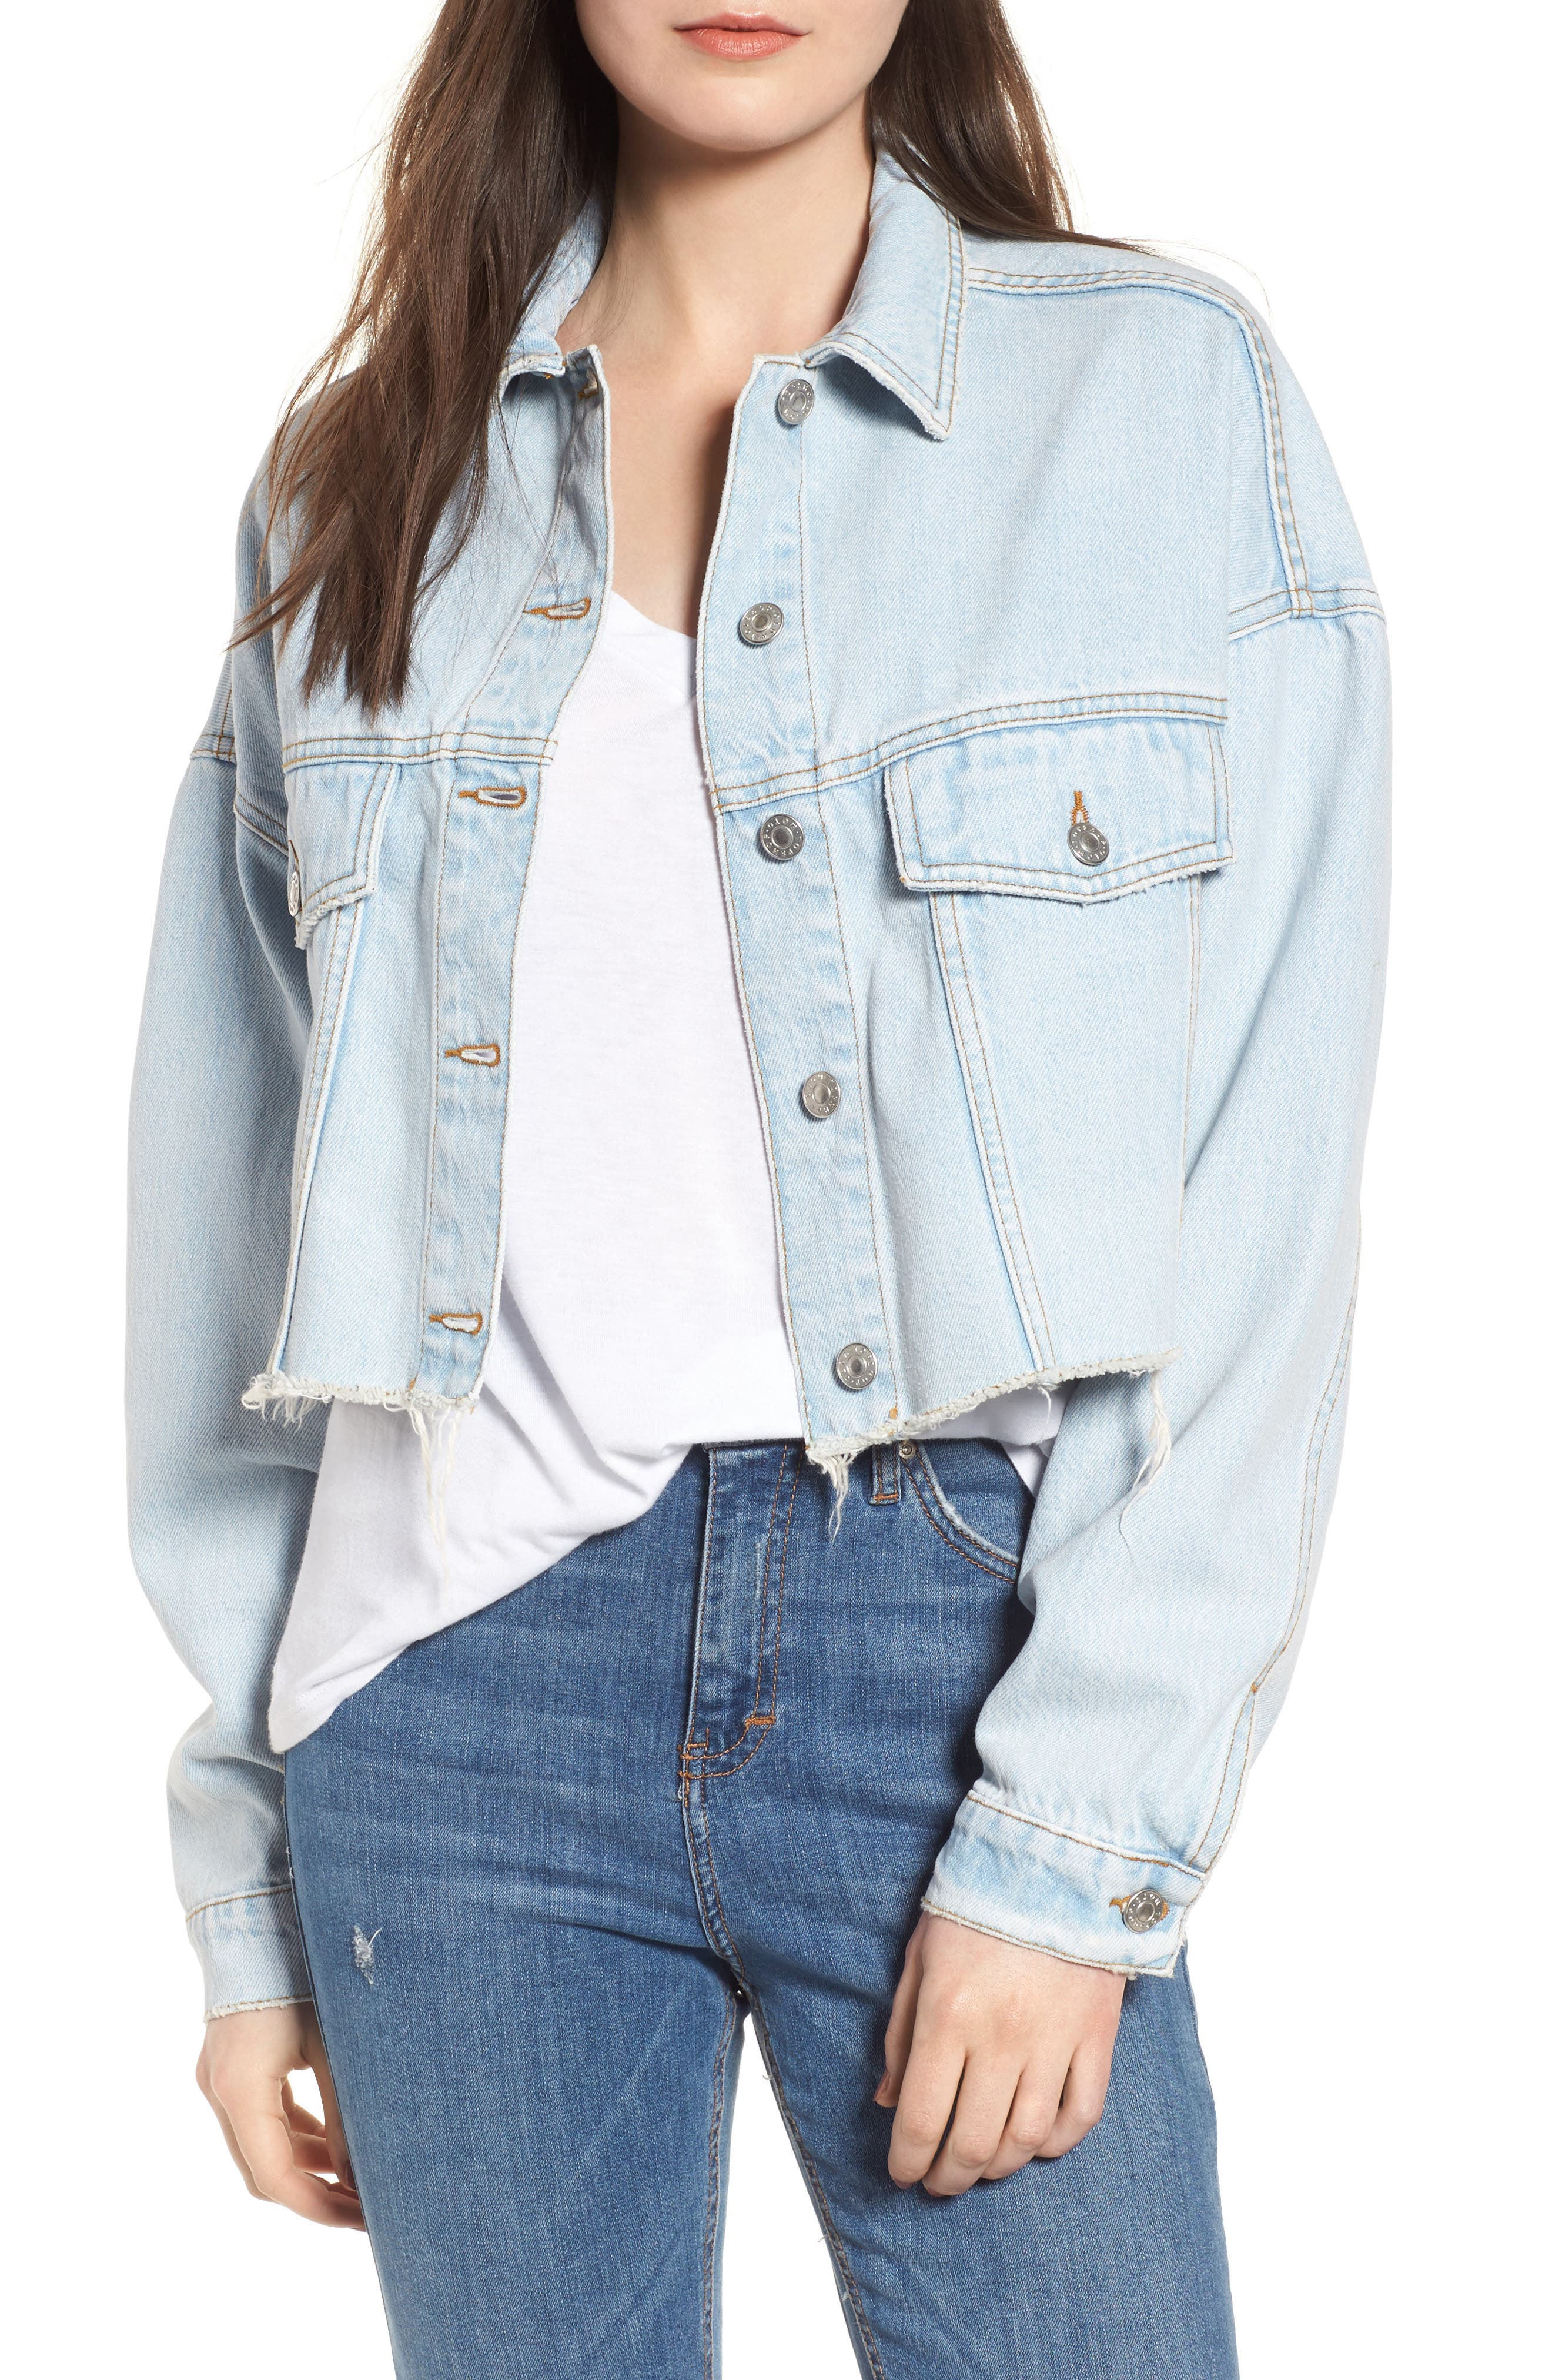 Topshop Bleached Cutoff Denim Jacket